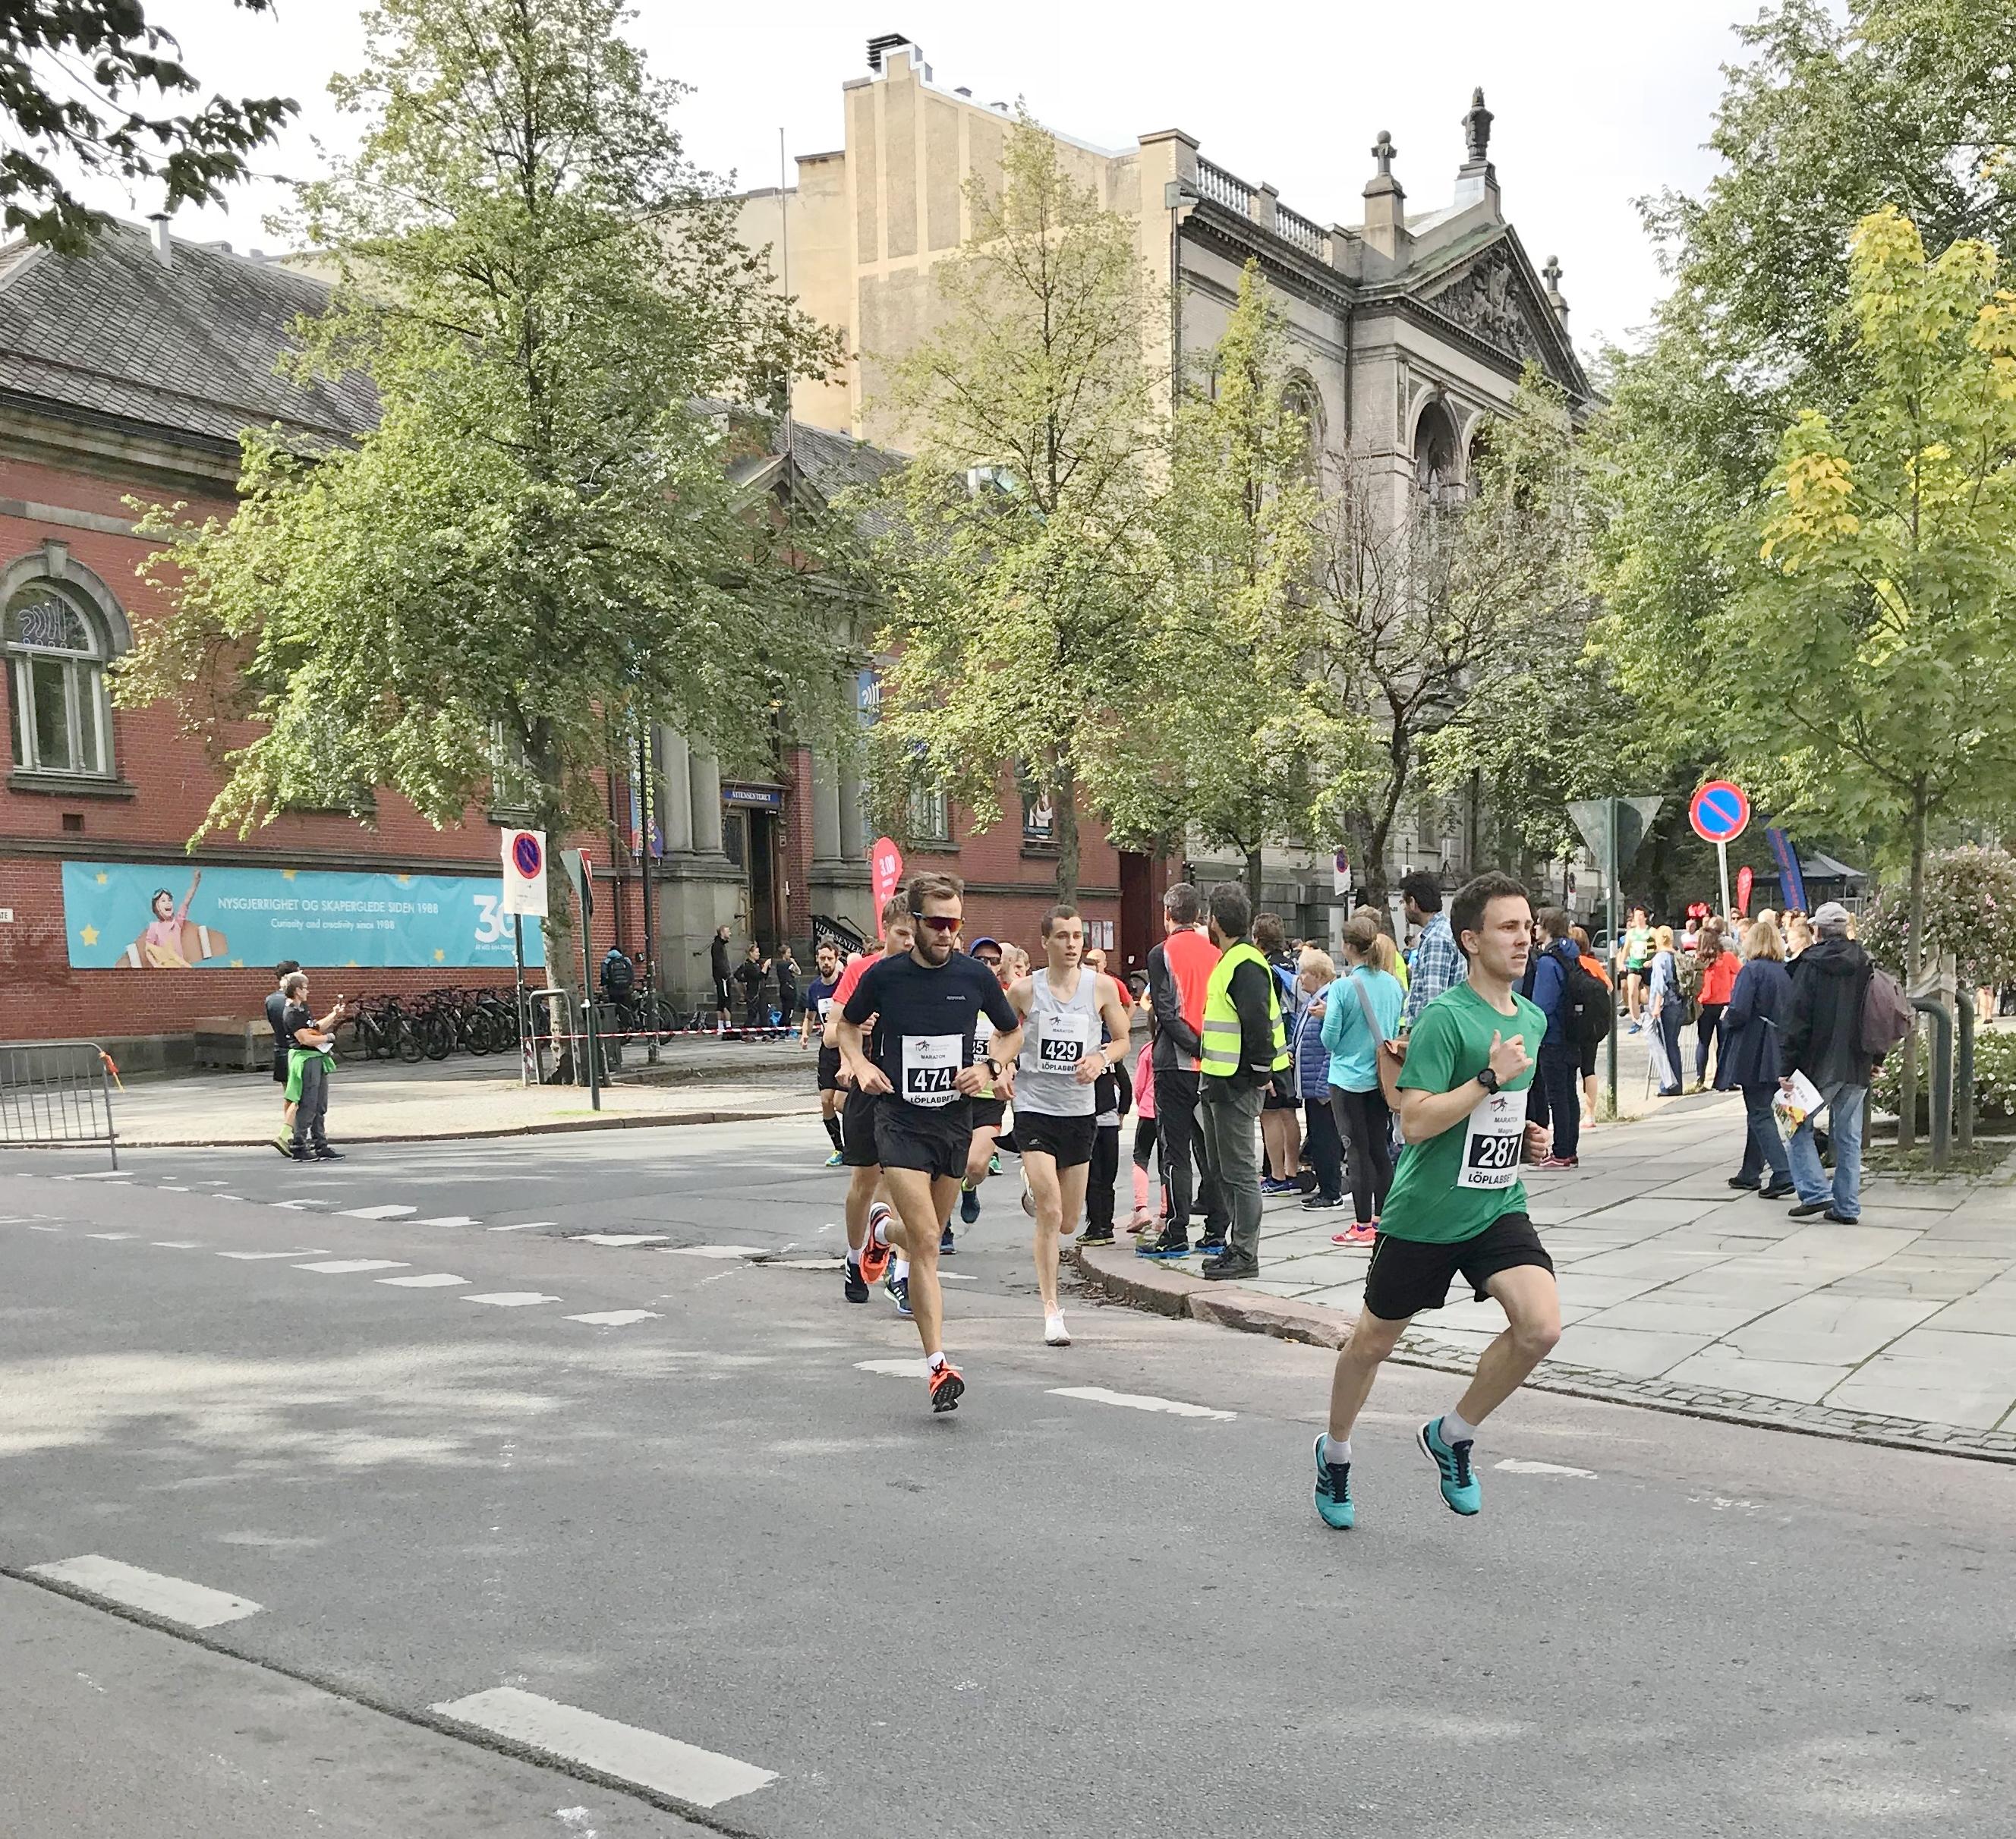 Start_maraton_foto_SolHaugen2.jpg